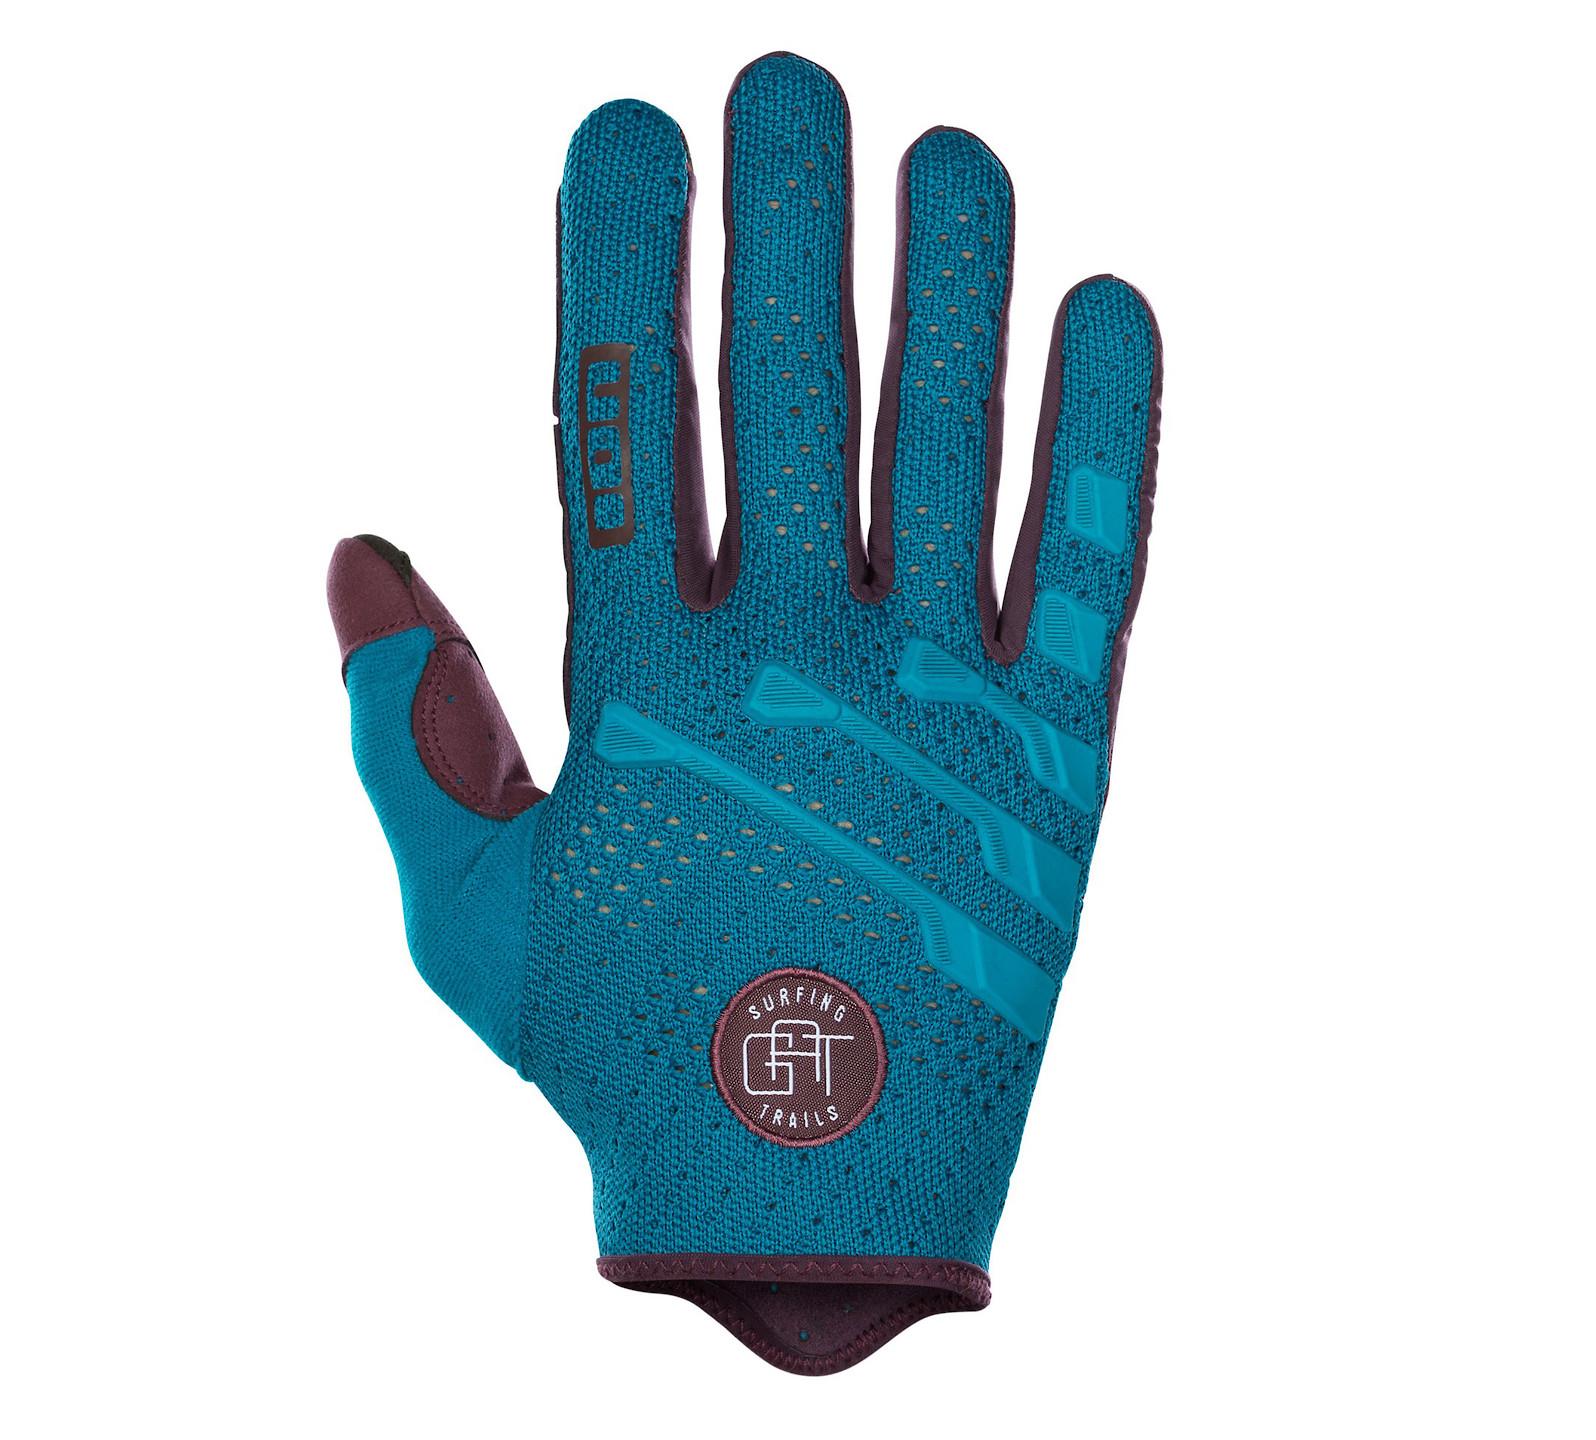 ION Gat Glove (off shore)